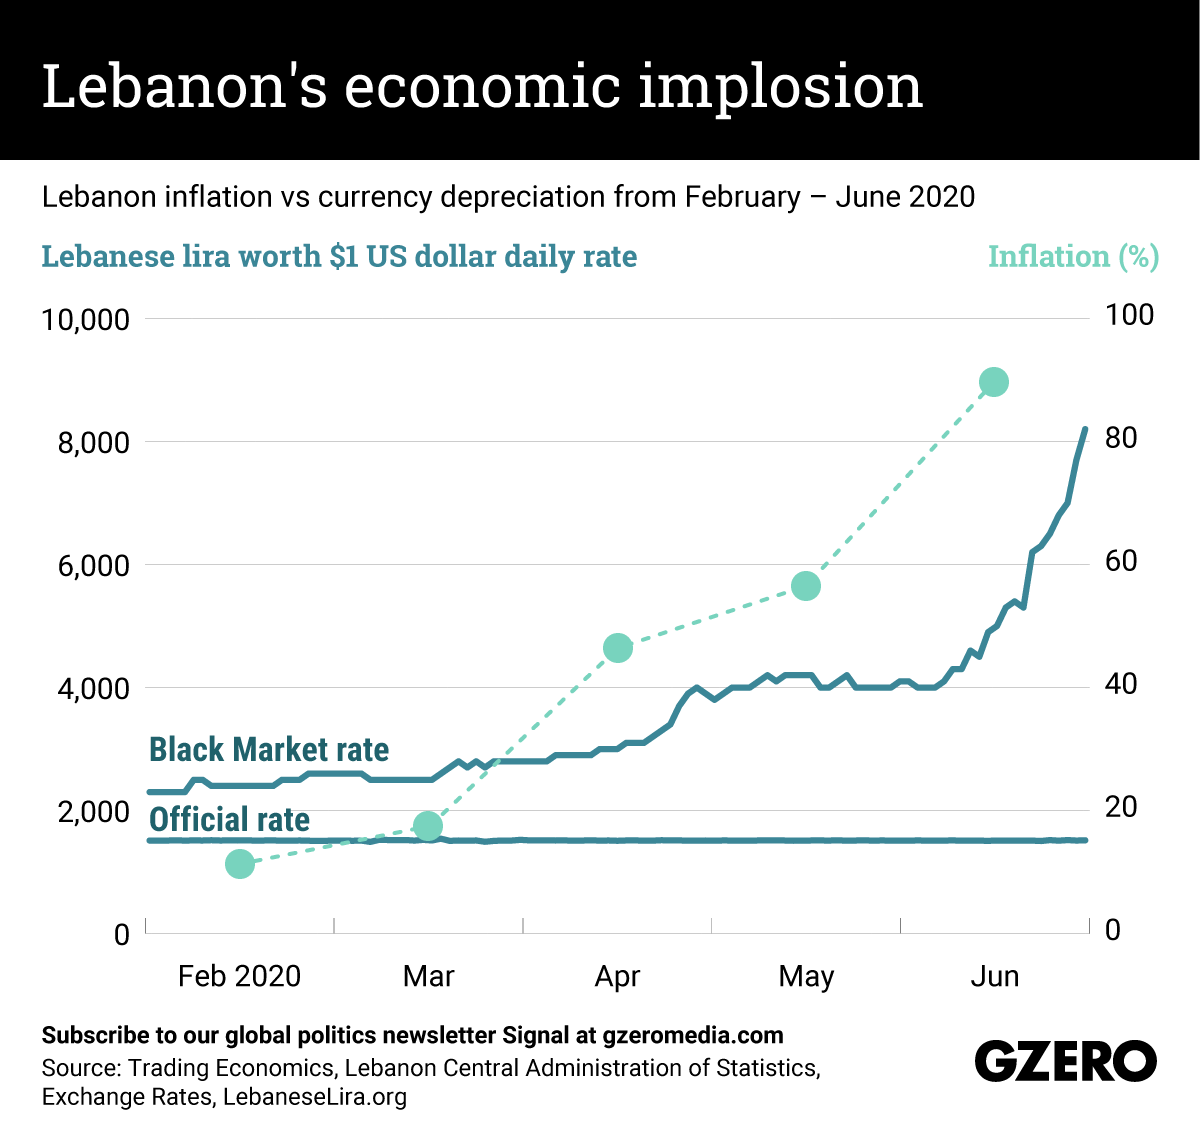 The Graphic Truth: Lebanon's economic implosion